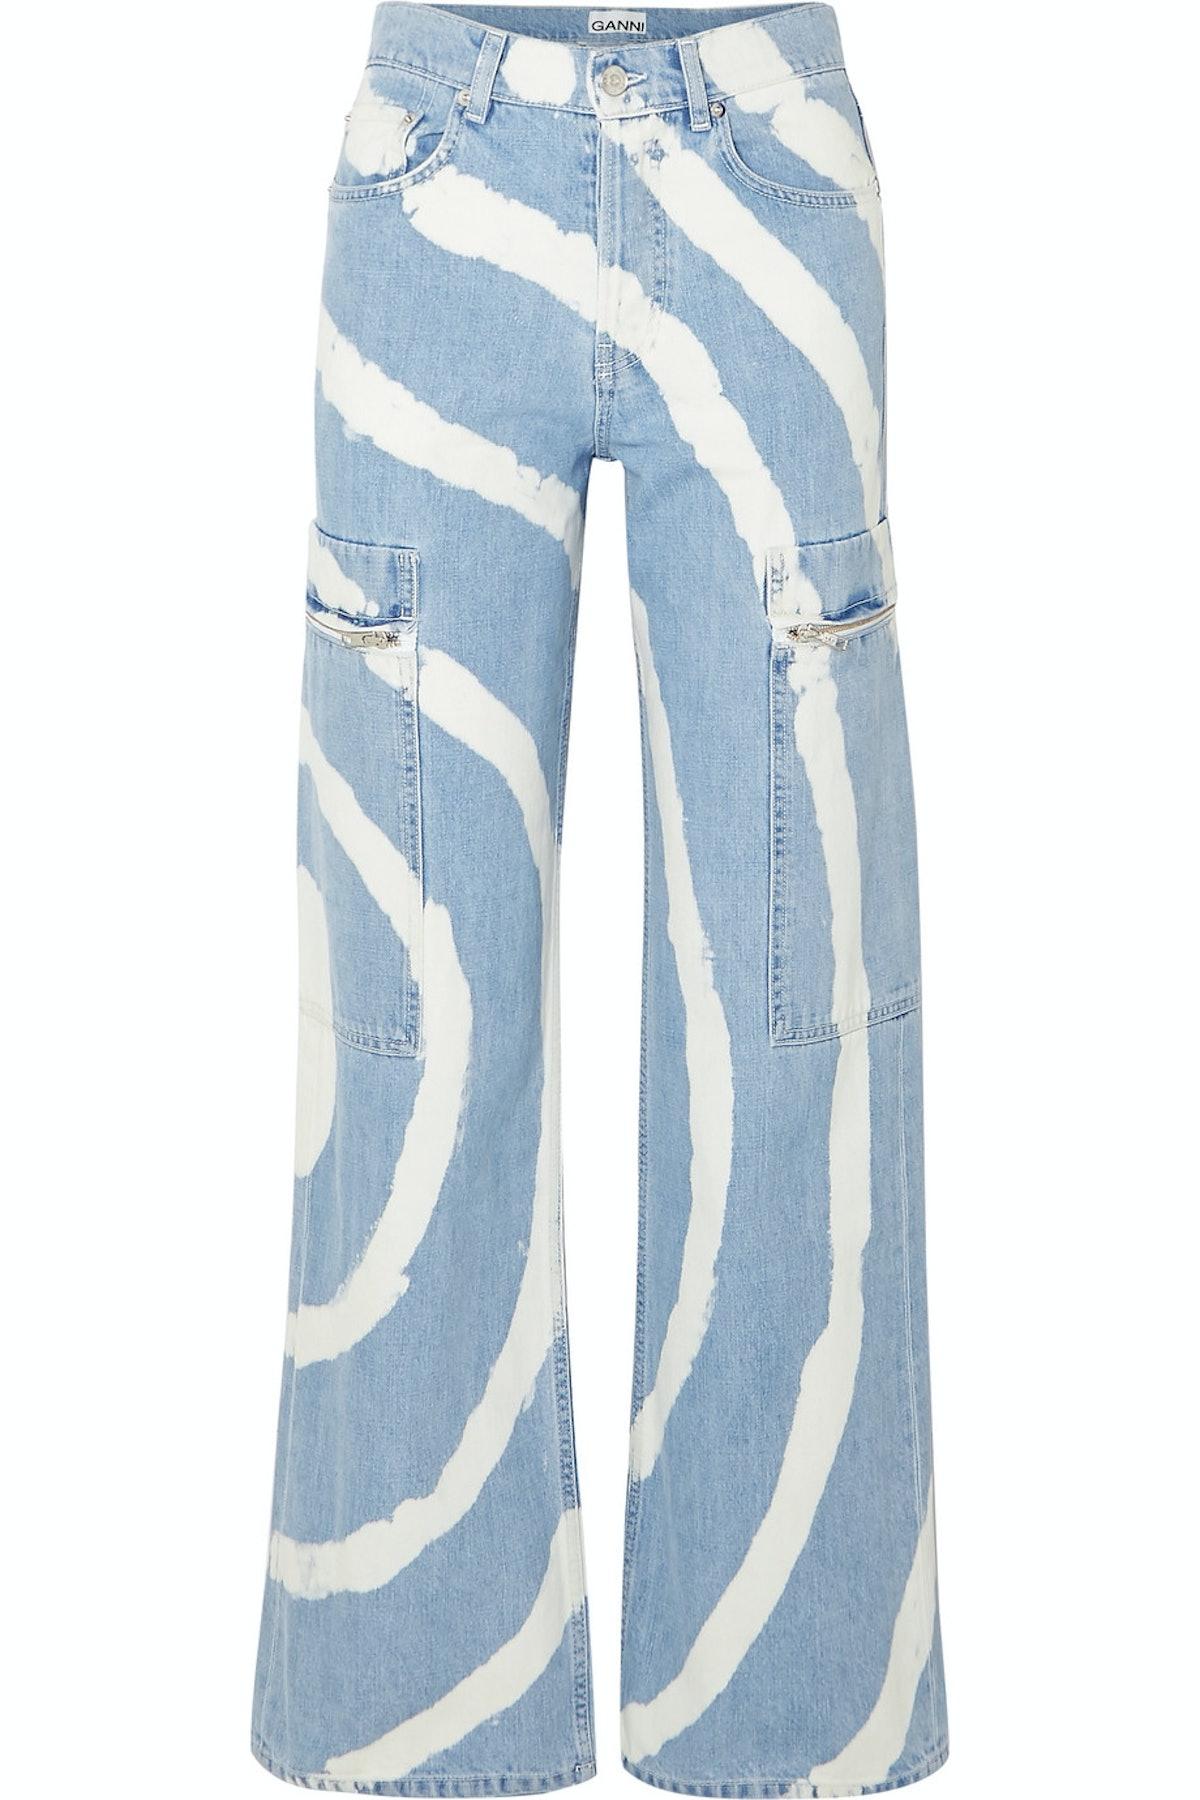 Blackstone Bleached High-Rise Wide-Leg Jeans